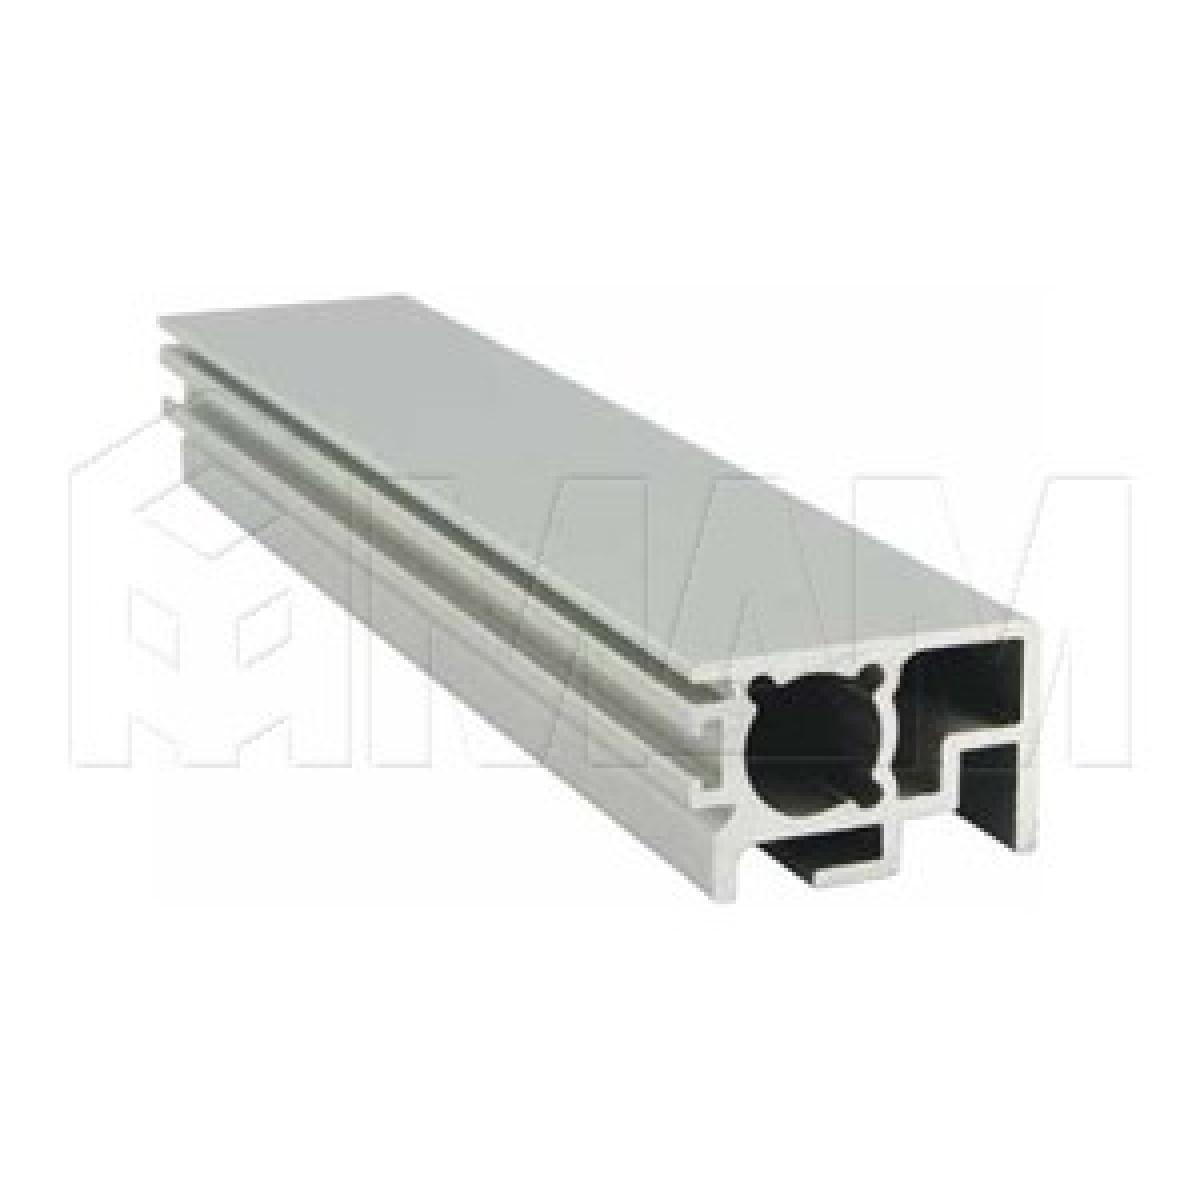 PS19 Вертик. профиль узкий, серебро, L-3000